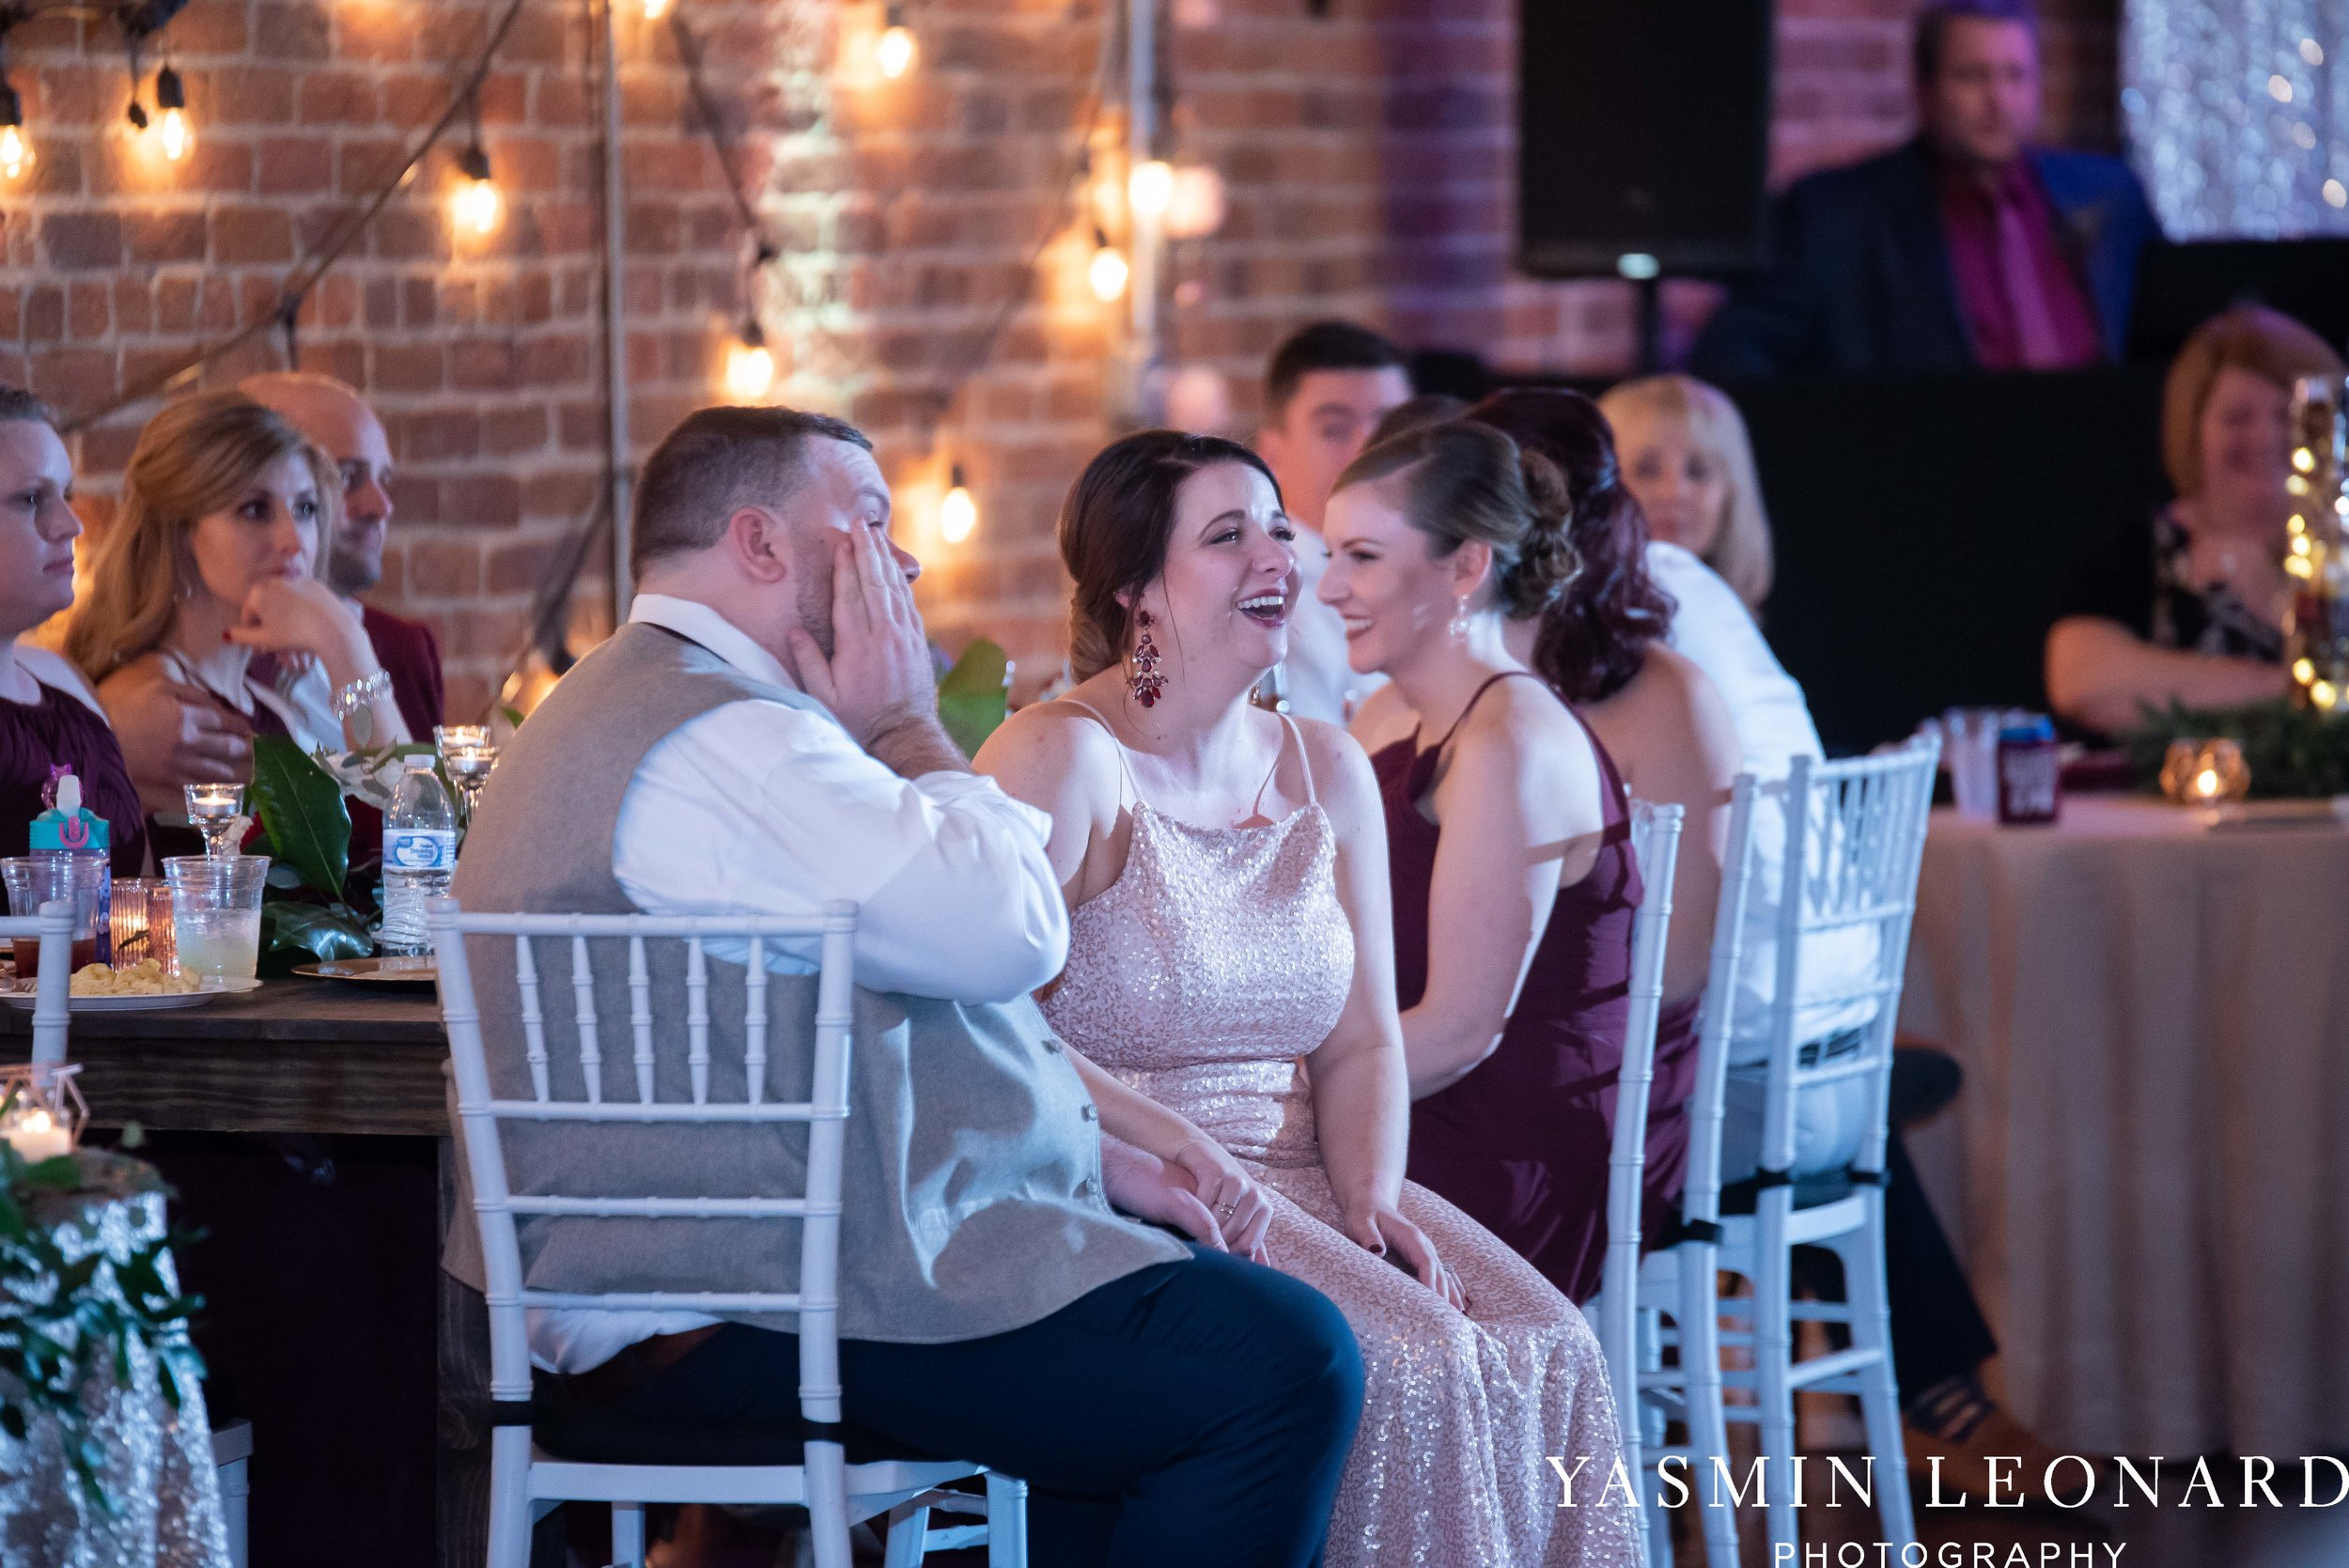 Rebekah and Matt - 105 Worth Event Centre - Yasmin Leonard Photography - Asheboro Wedding - NC Wedding - High Point Weddings - Triad Weddings - Winter Wedding-55.jpg